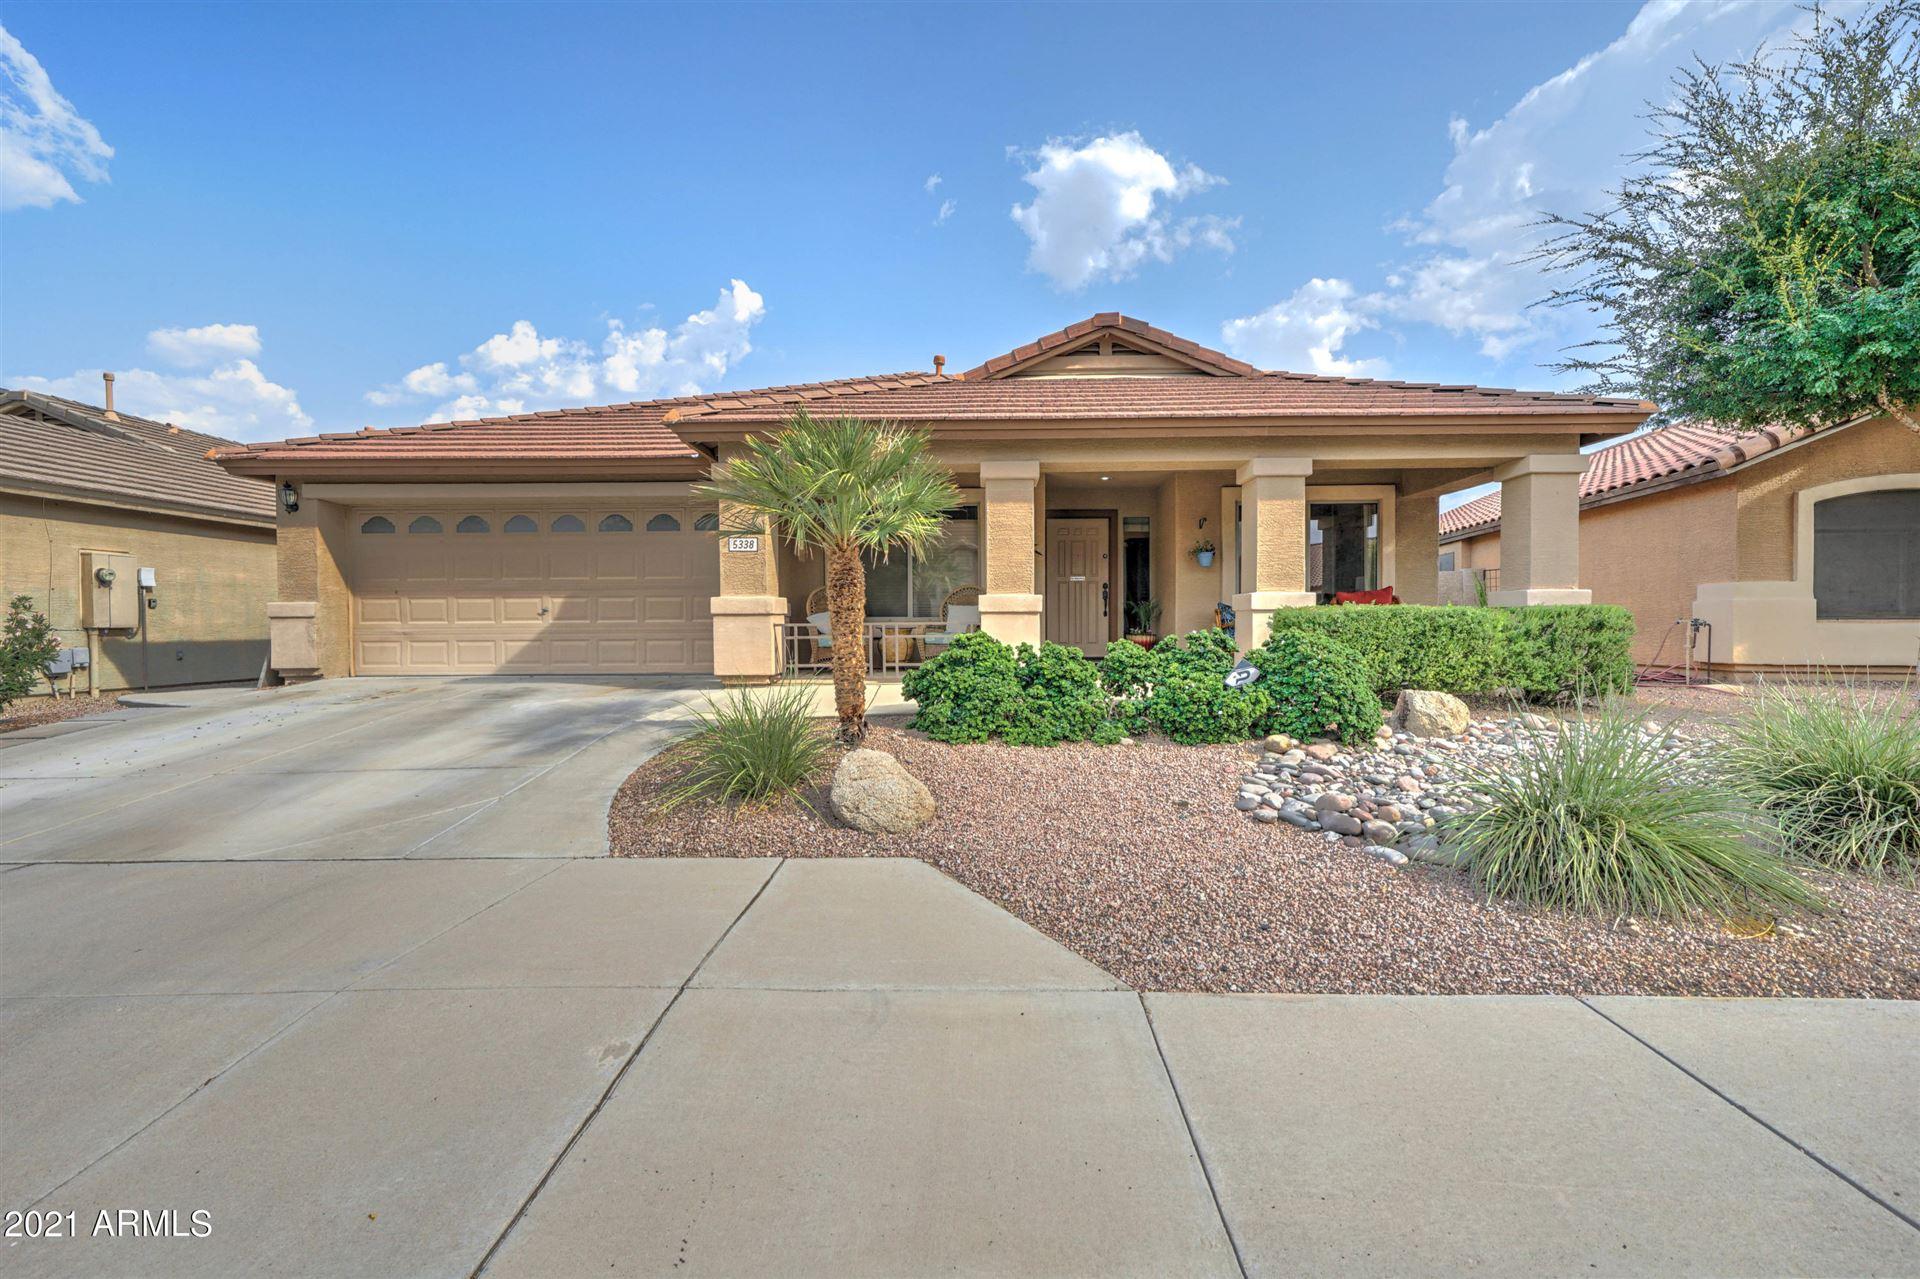 Photo of 5338 N ORMONDO Way, Litchfield Park, AZ 85340 (MLS # 6268797)